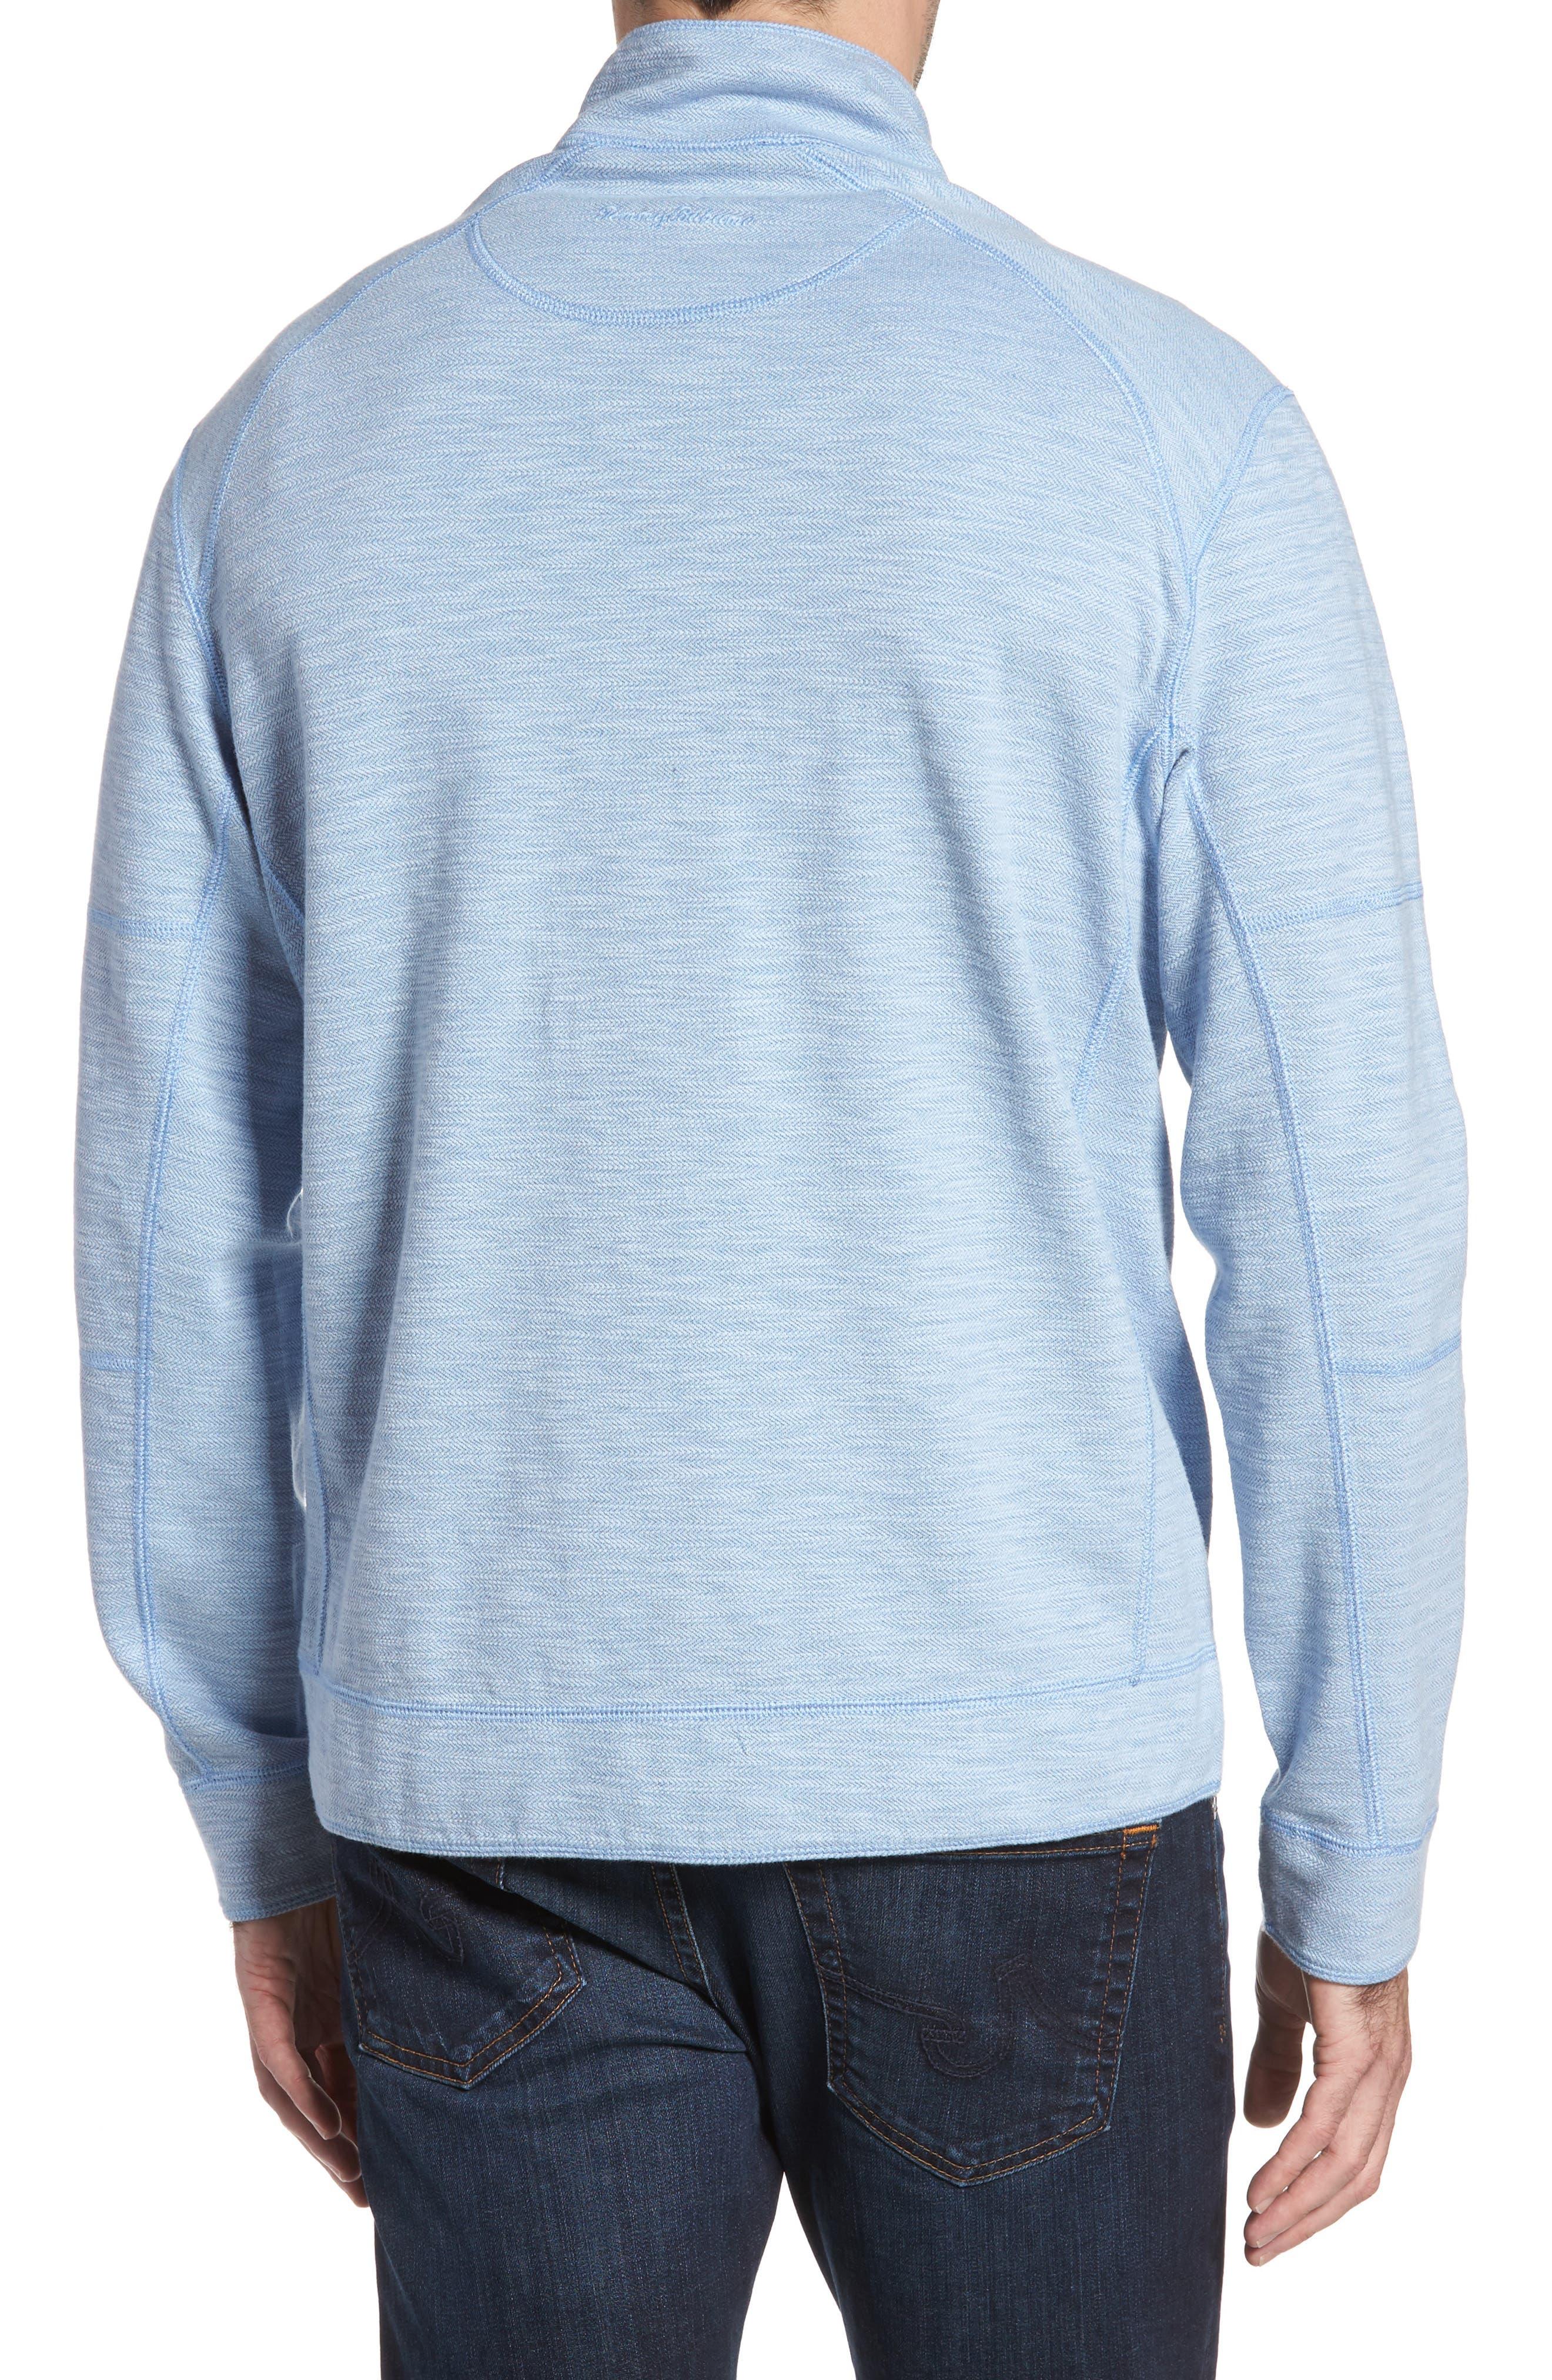 Sandbar Slub Reversible Quarter Zip Pullover,                             Alternate thumbnail 9, color,